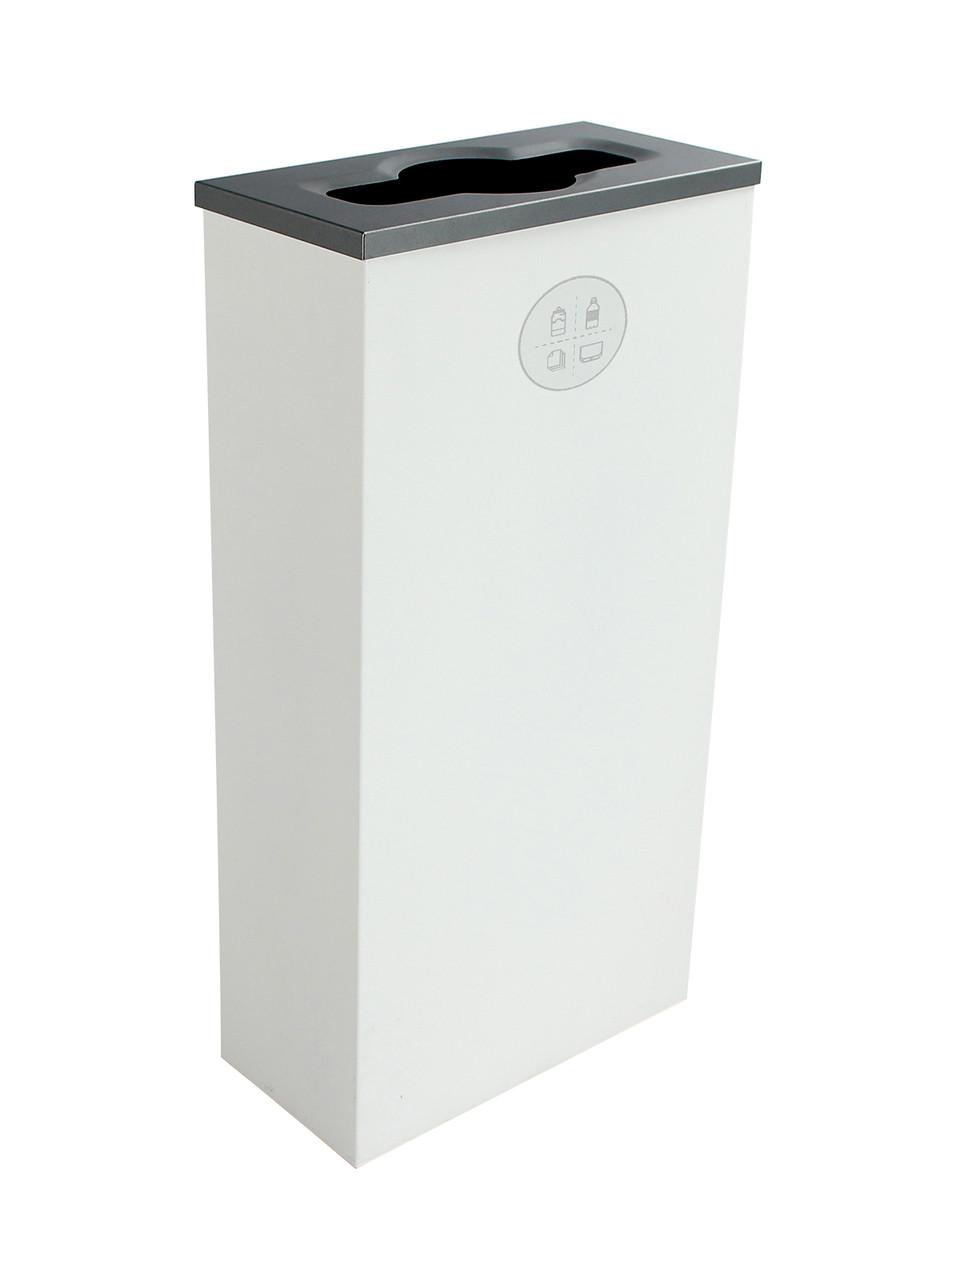 10 Gallon Steel Spectrum Slim Mixed Recycling Bin White 8107061-2